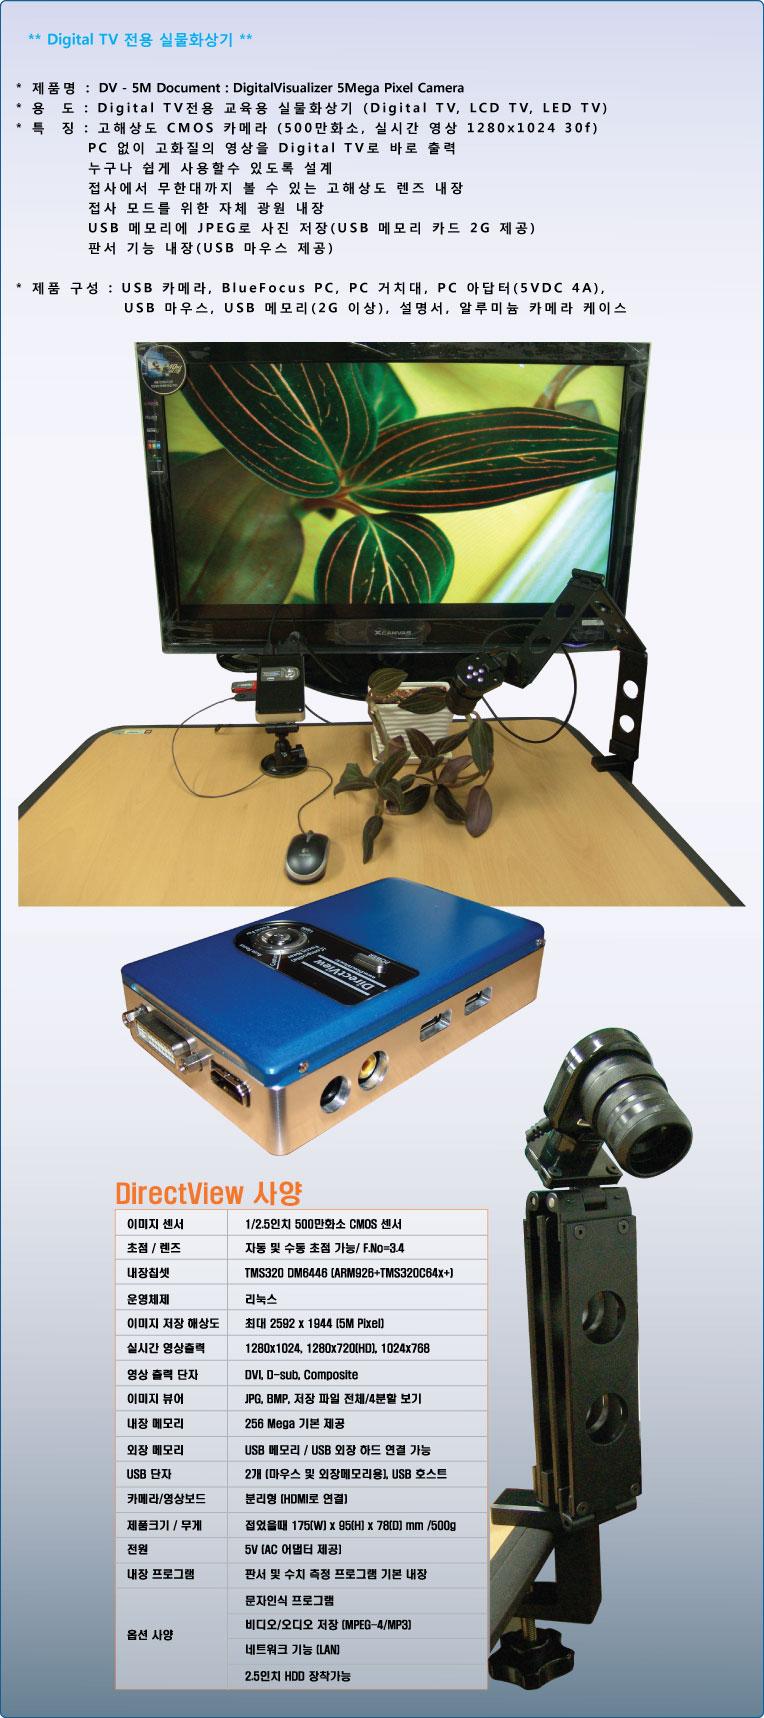 Bluefocus vision total solution - 5 5 designers bernardaud ...